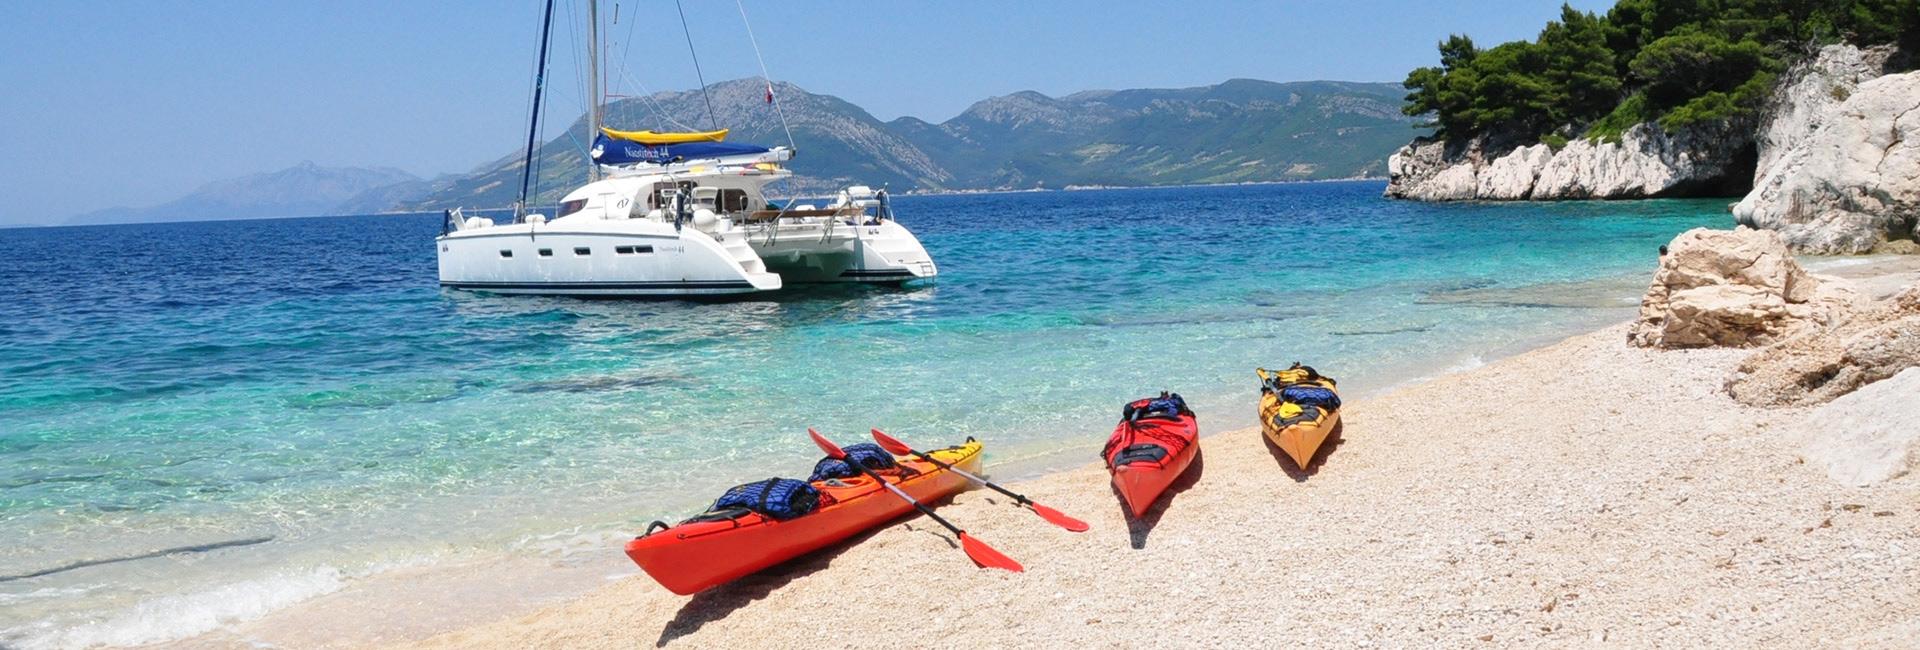 Dubrovnik Adventure Sailing Break